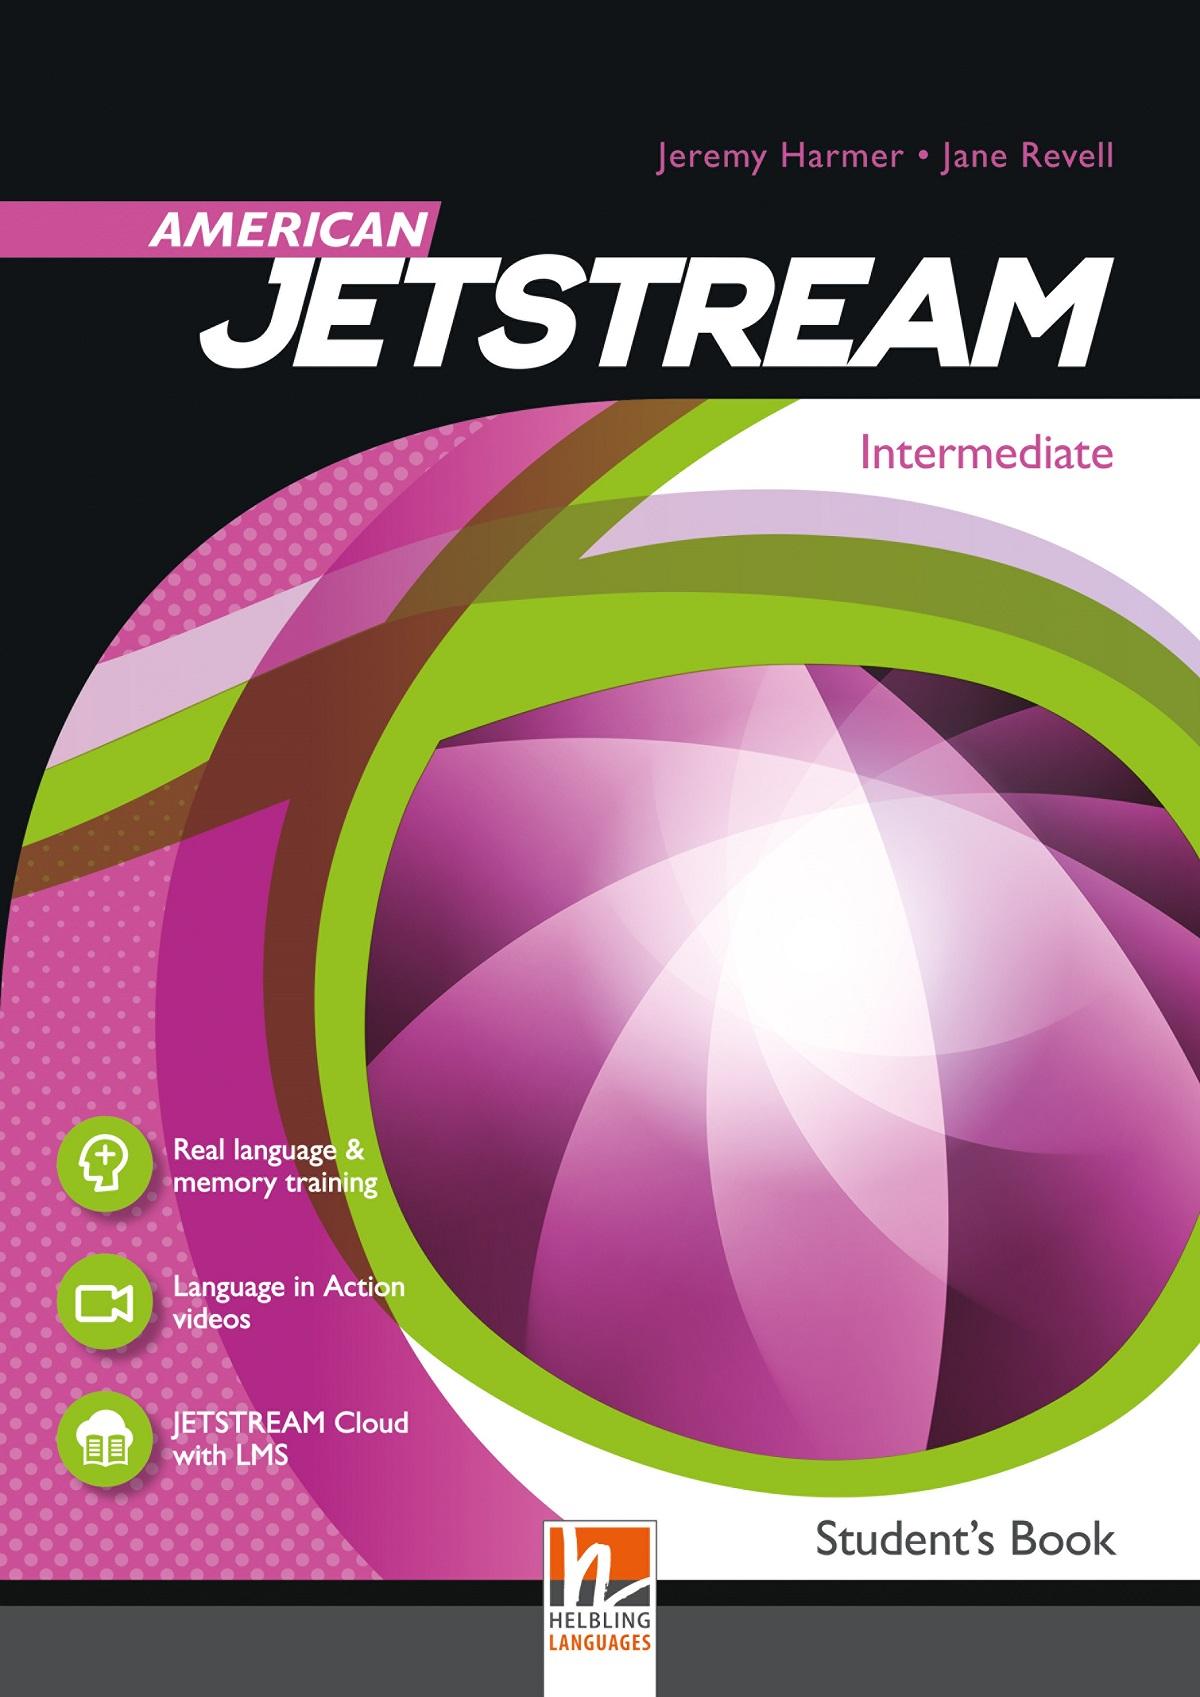 American Jetstream: Intermediate English Central